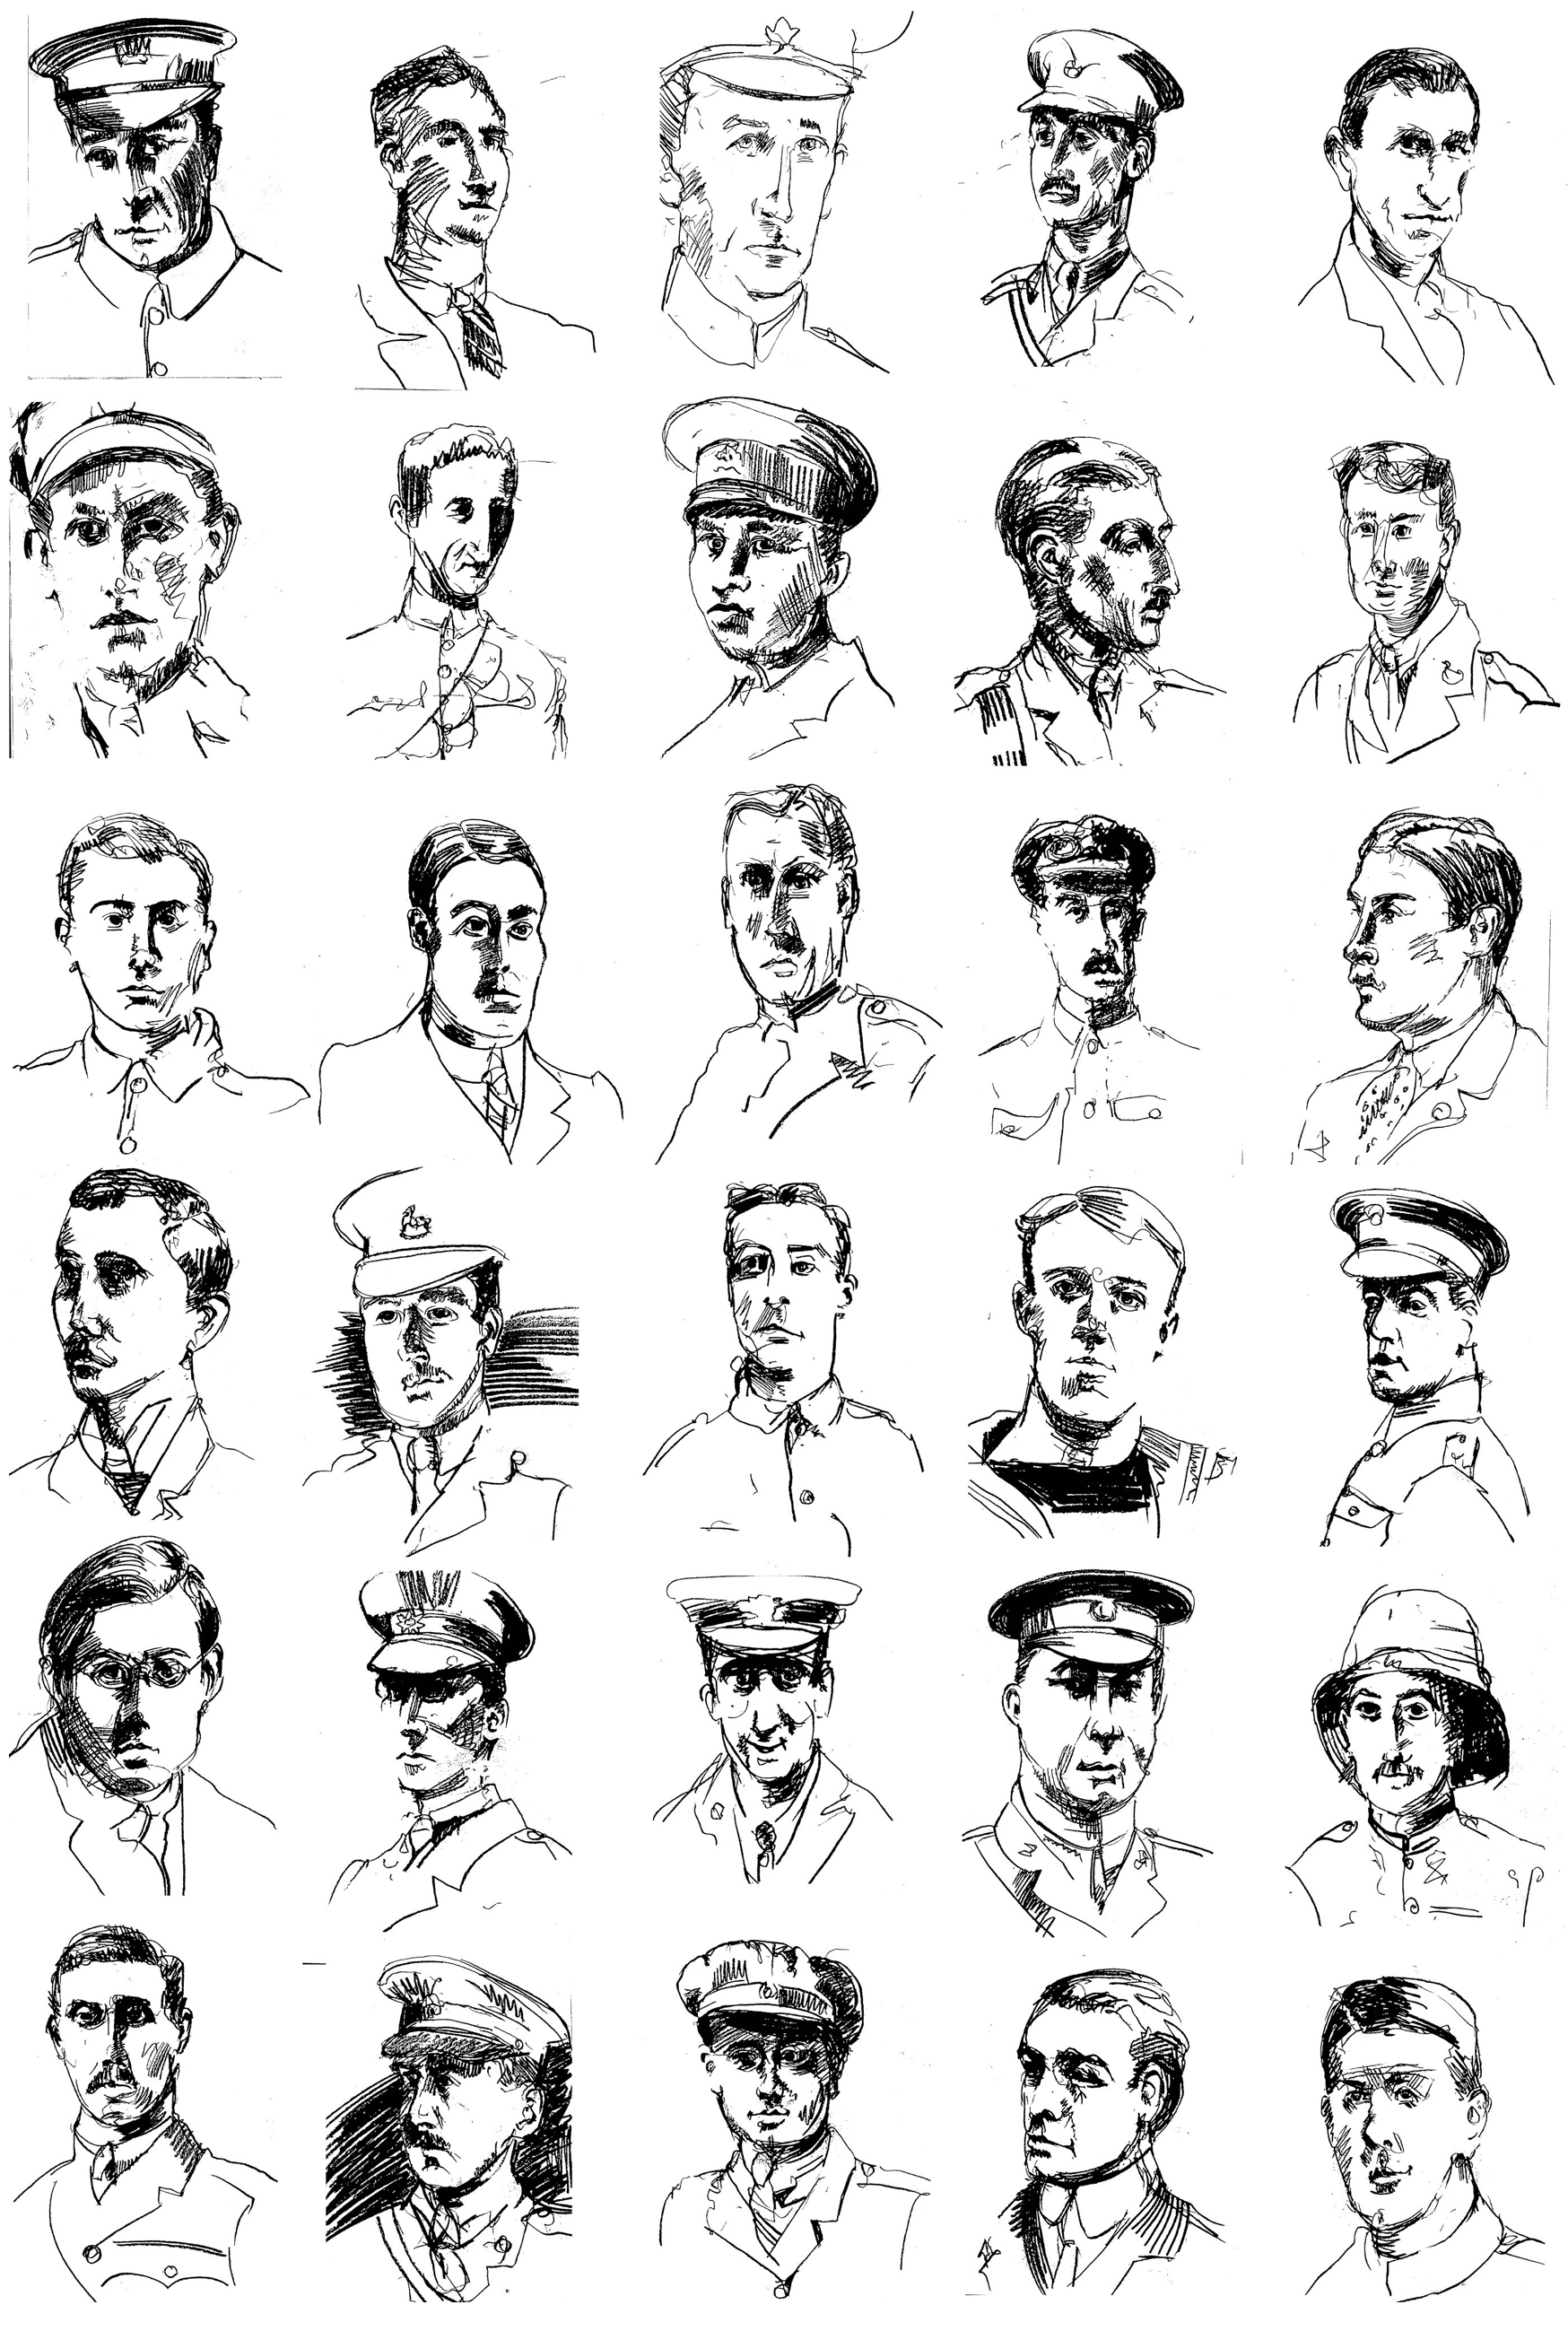 Posthumous portraits